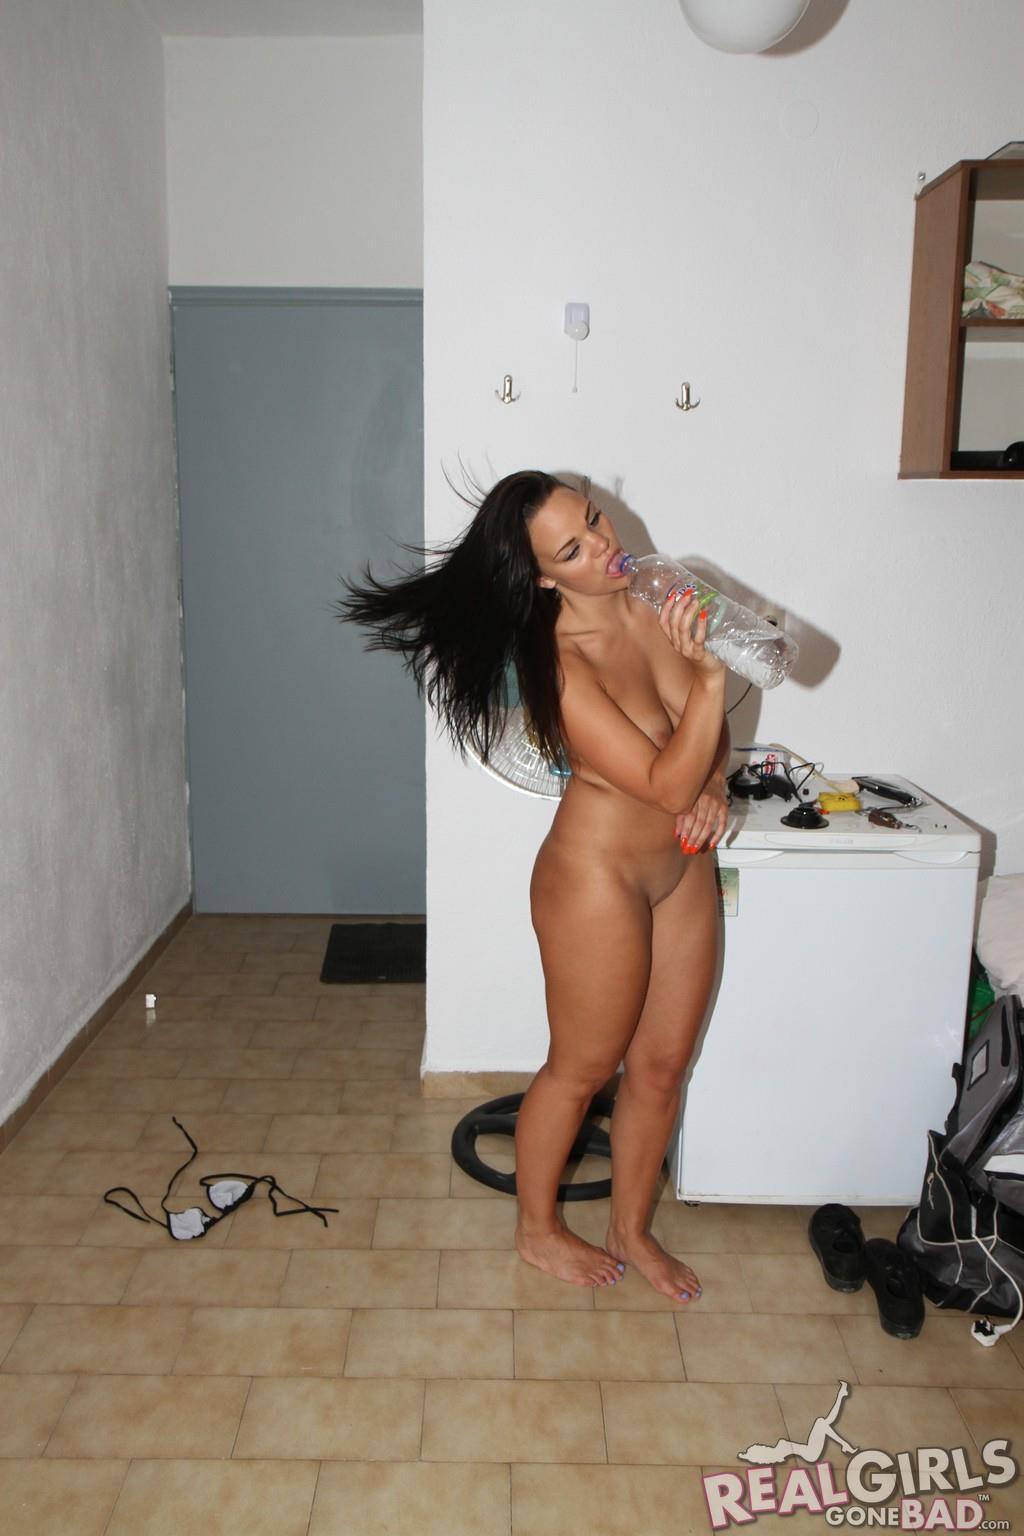 Nude Girls Gone Bad